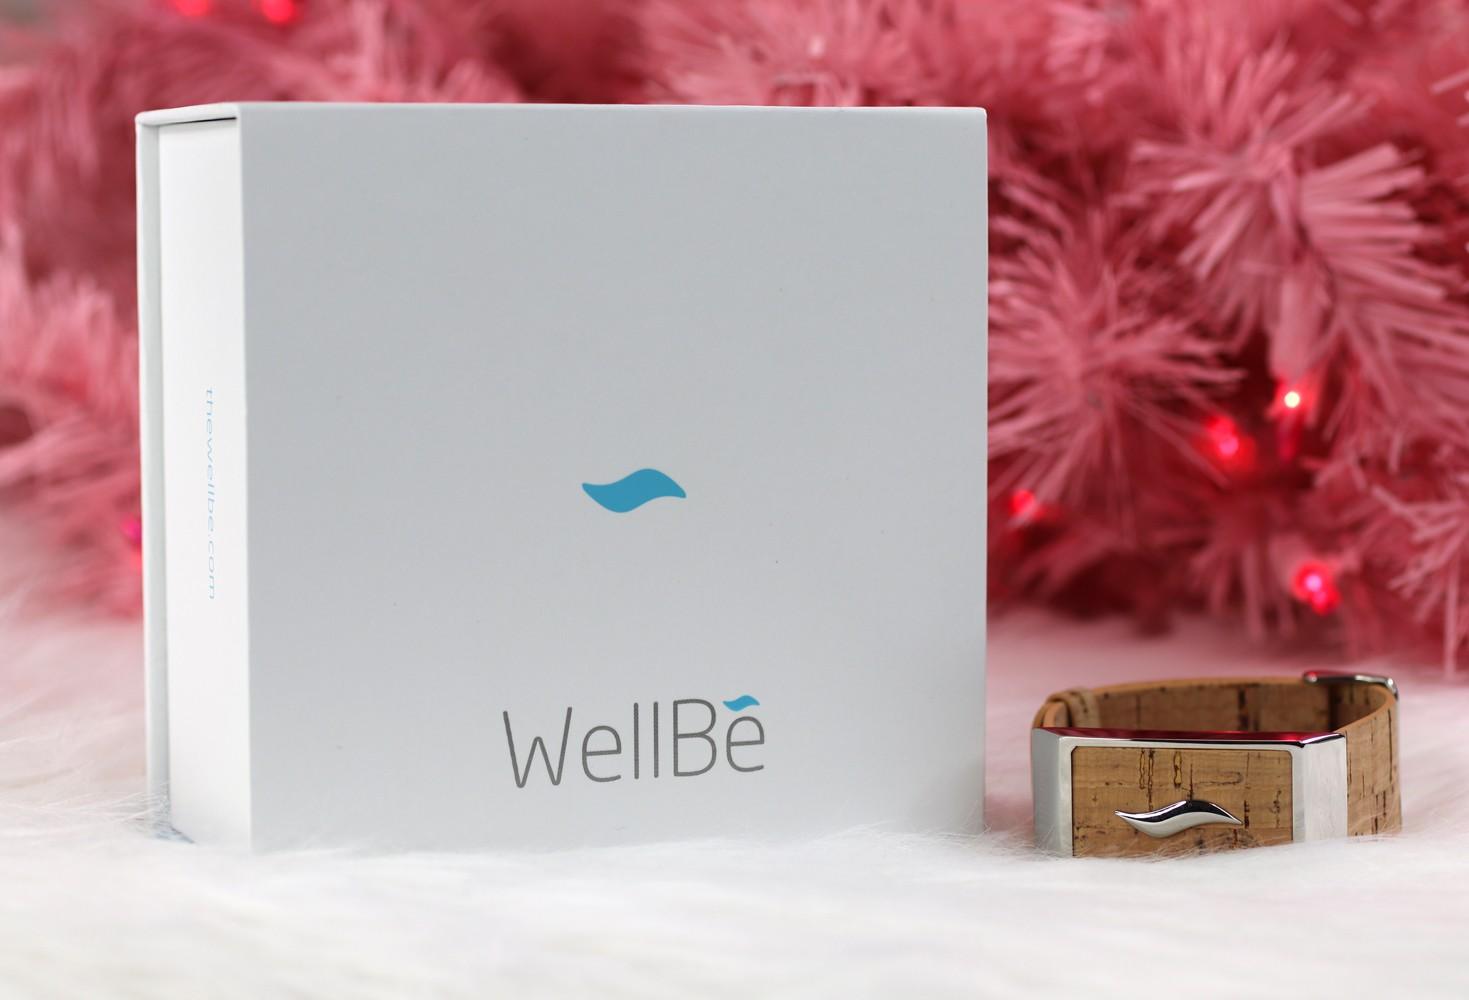 The WellBe Stress Reduction Bracelet